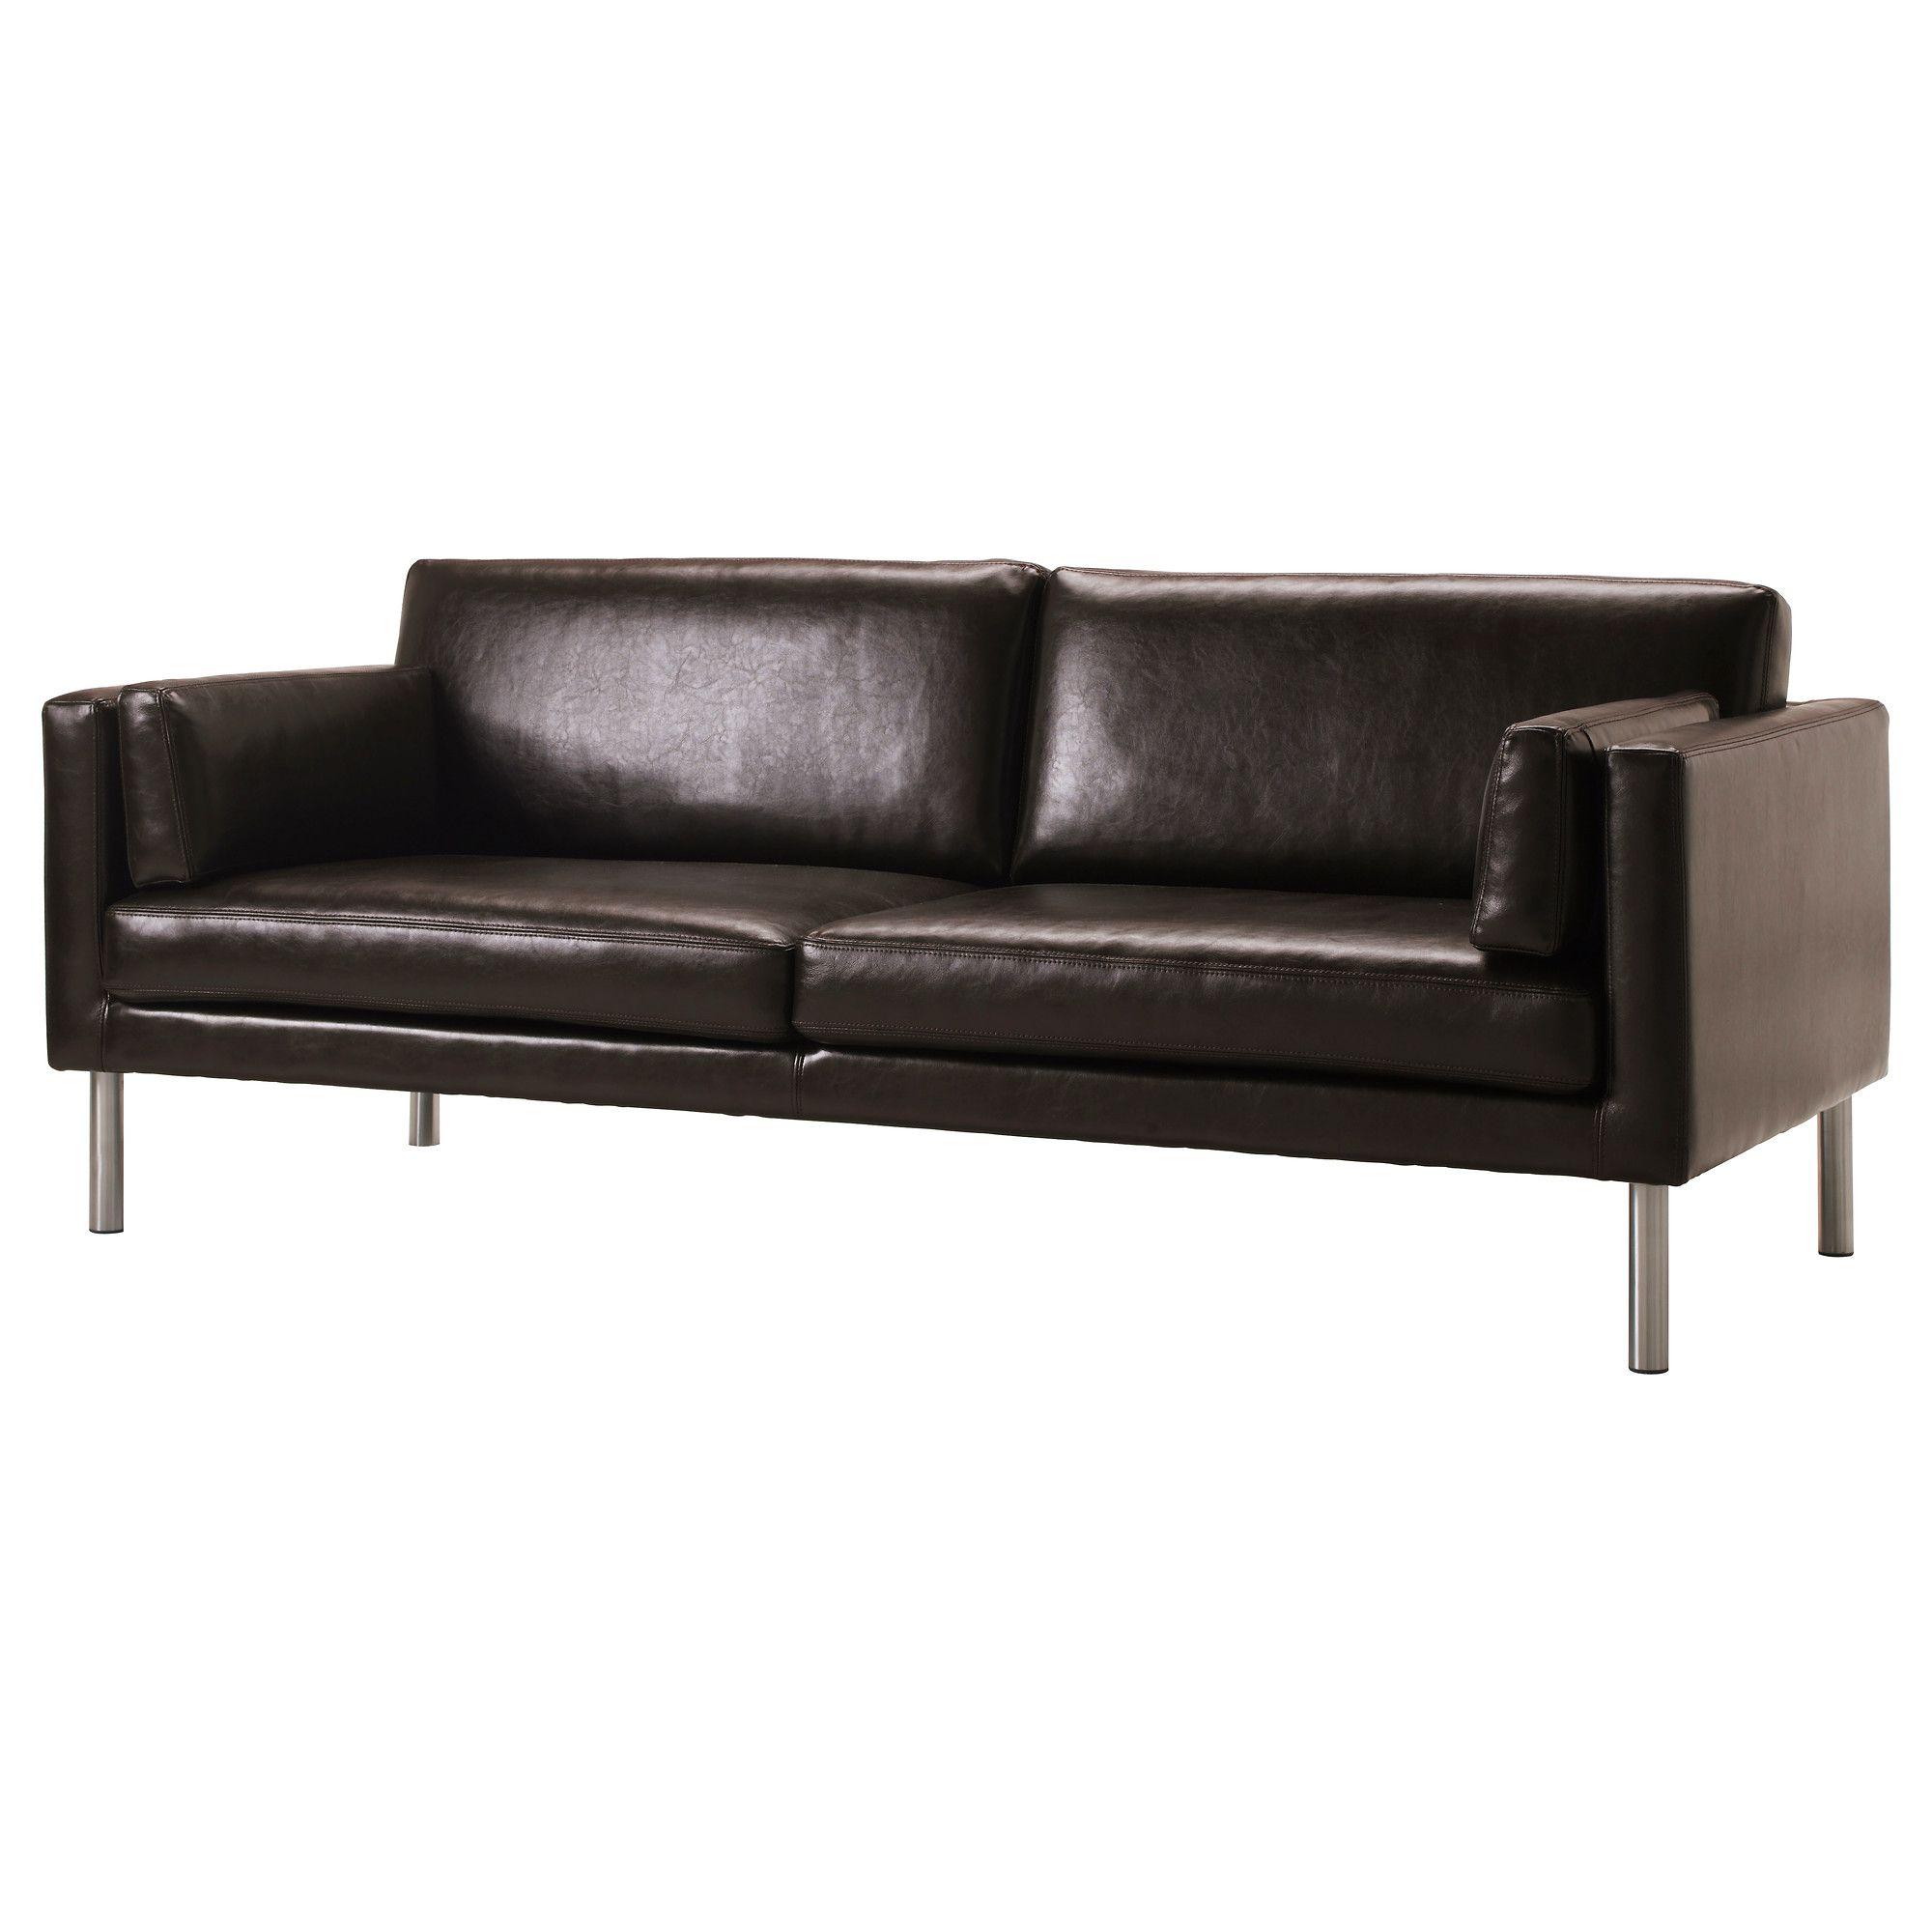 Ikea Us Furniture And Home Furnishings Leather Sofa Bed Ikea Sofa Ikea Leather Sofa